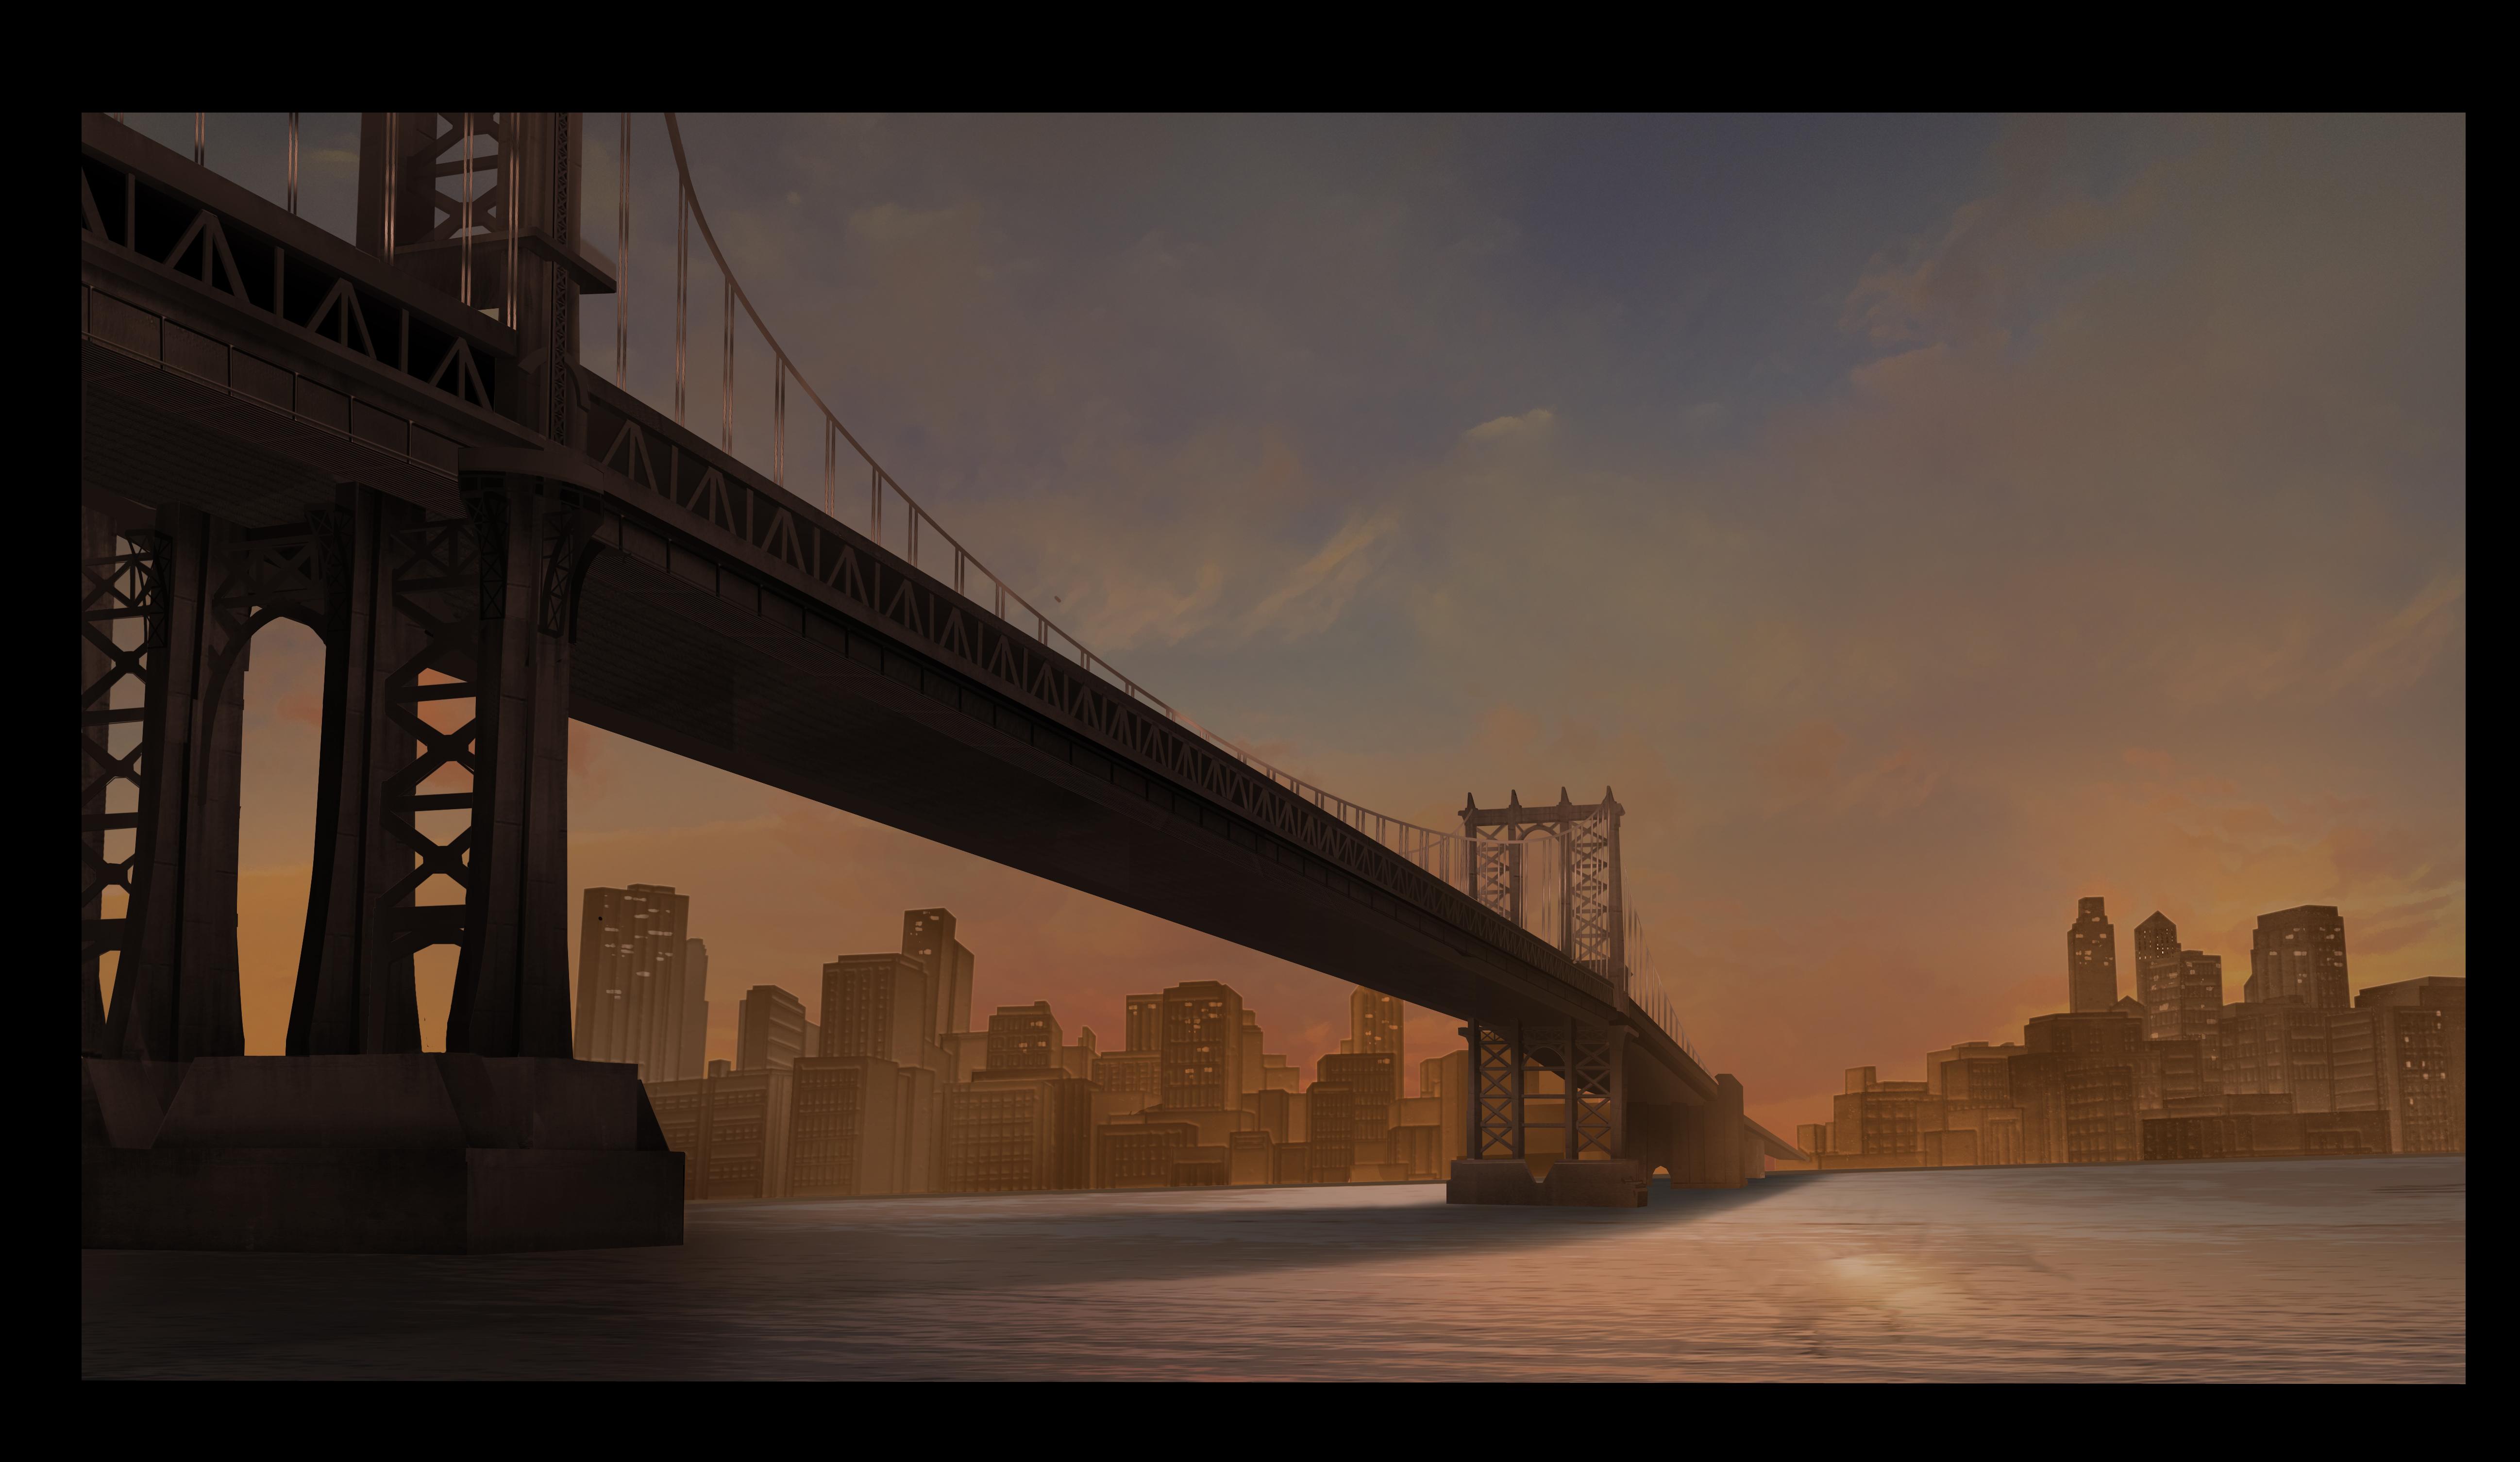 B050S010_026_EXT. Bridge_Low Angle.final.flat.jpg